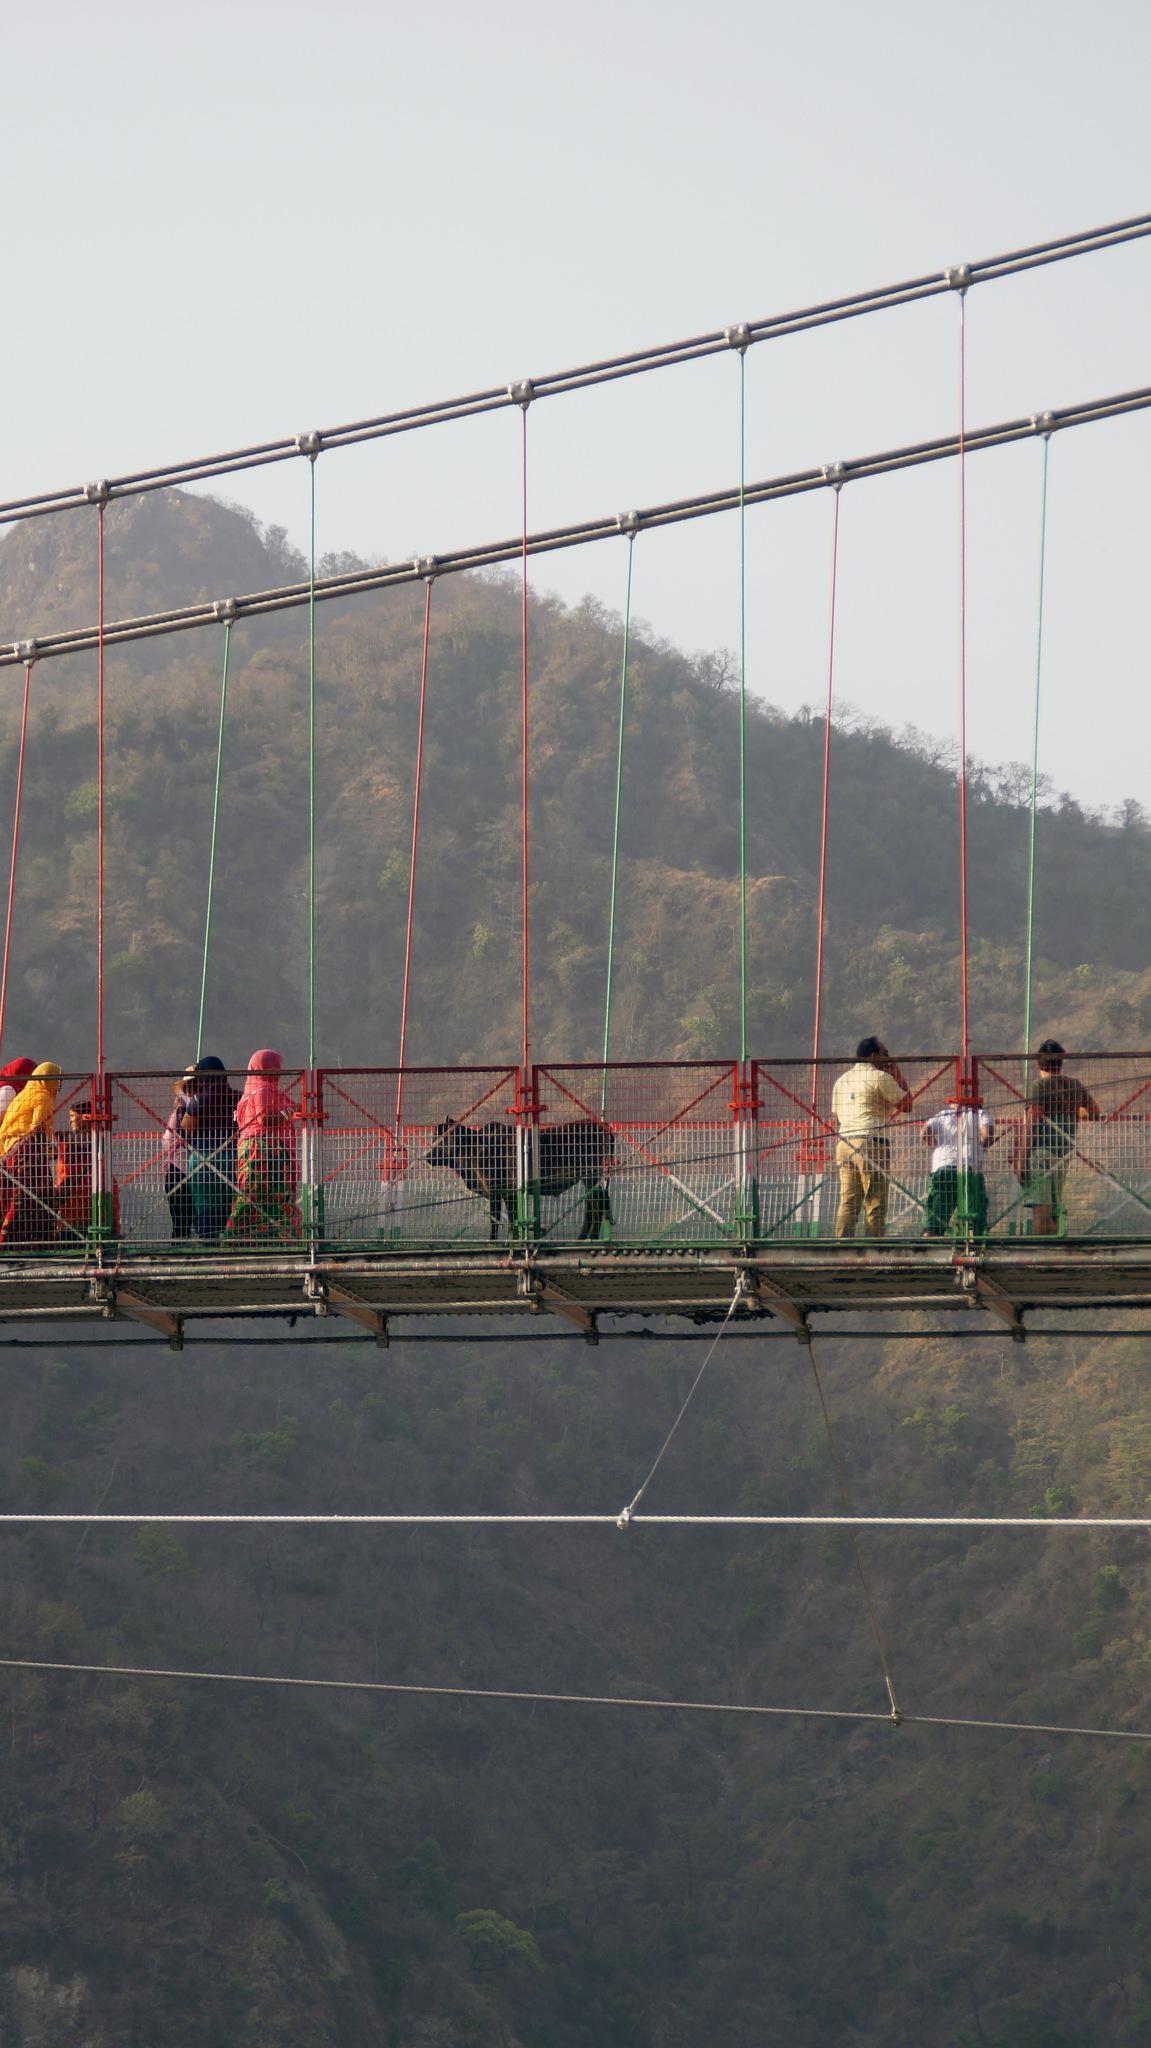 Laxman Jhula Bridge, Rishikesh, India 2017 by lars.erlandsson.9